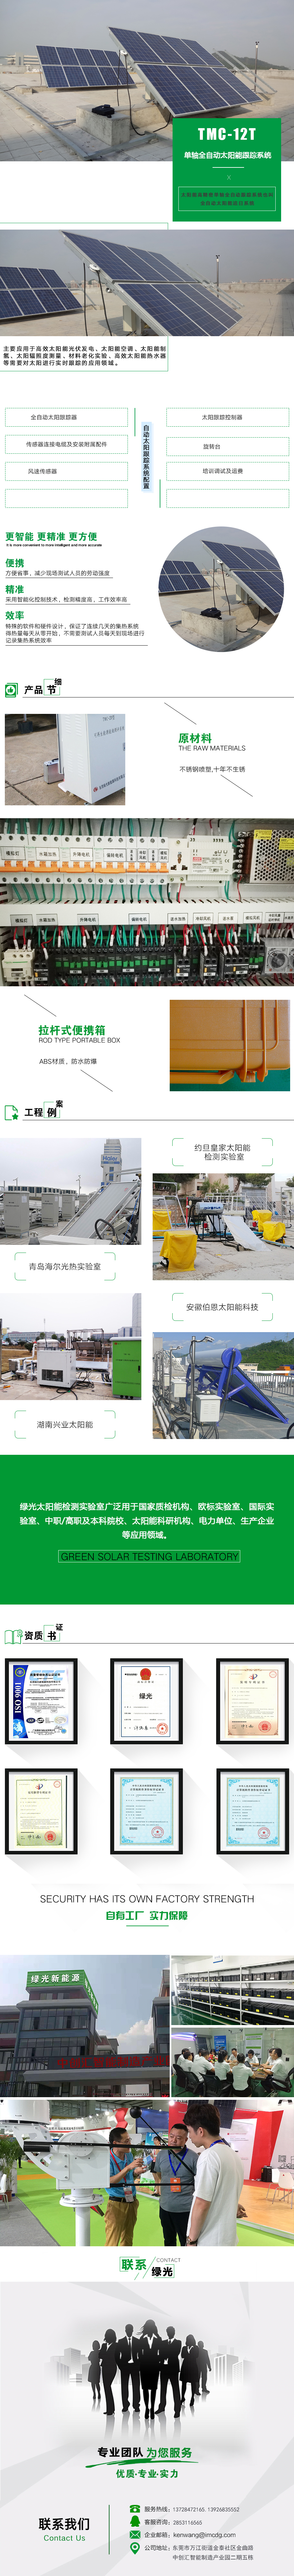 TMC-12T型单轴全自动太阳能跟踪系统.jpg